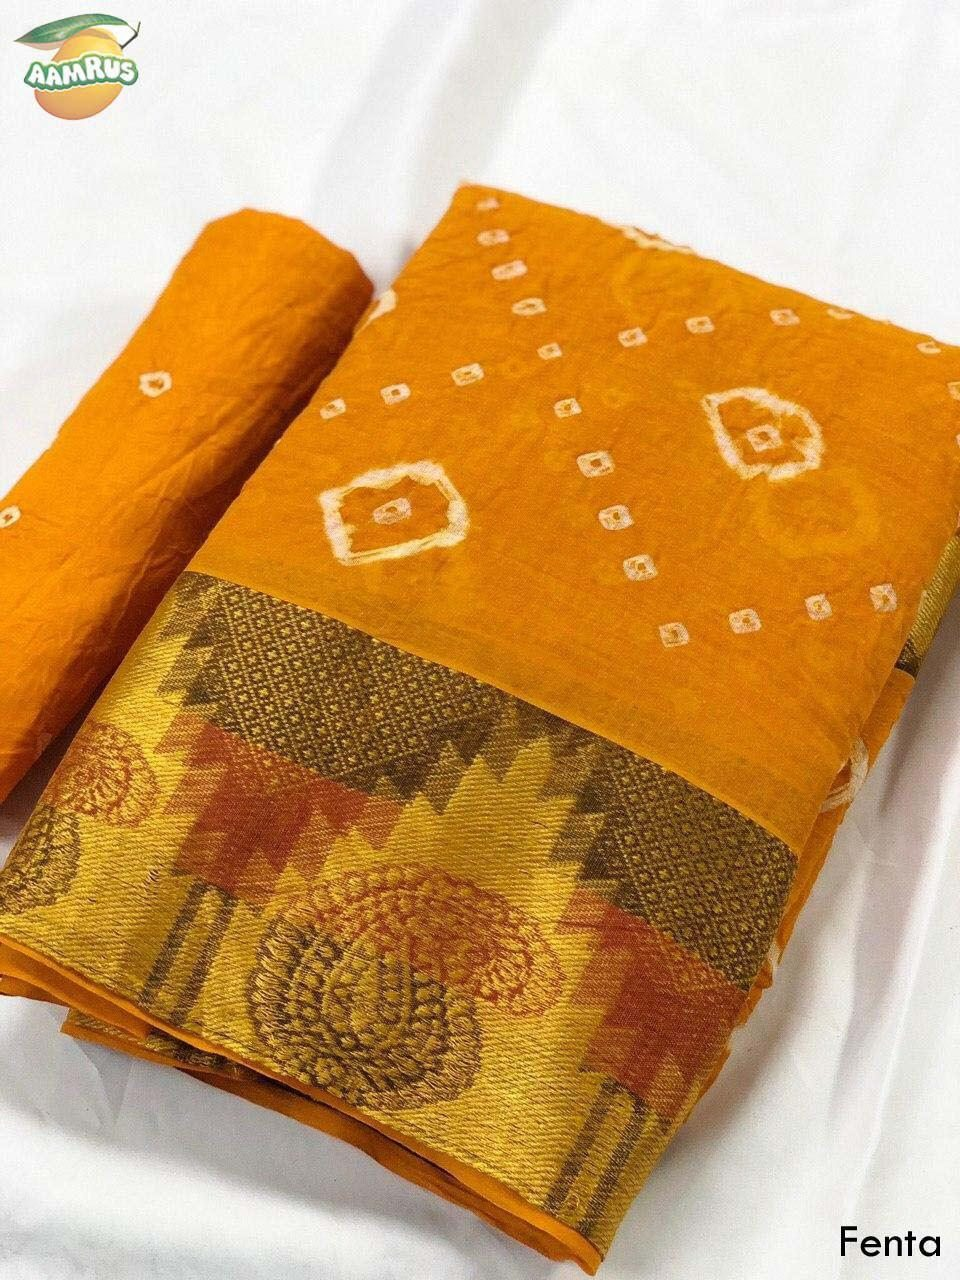 Ssm-Aamrus-Pure-Cotton-Saree-2